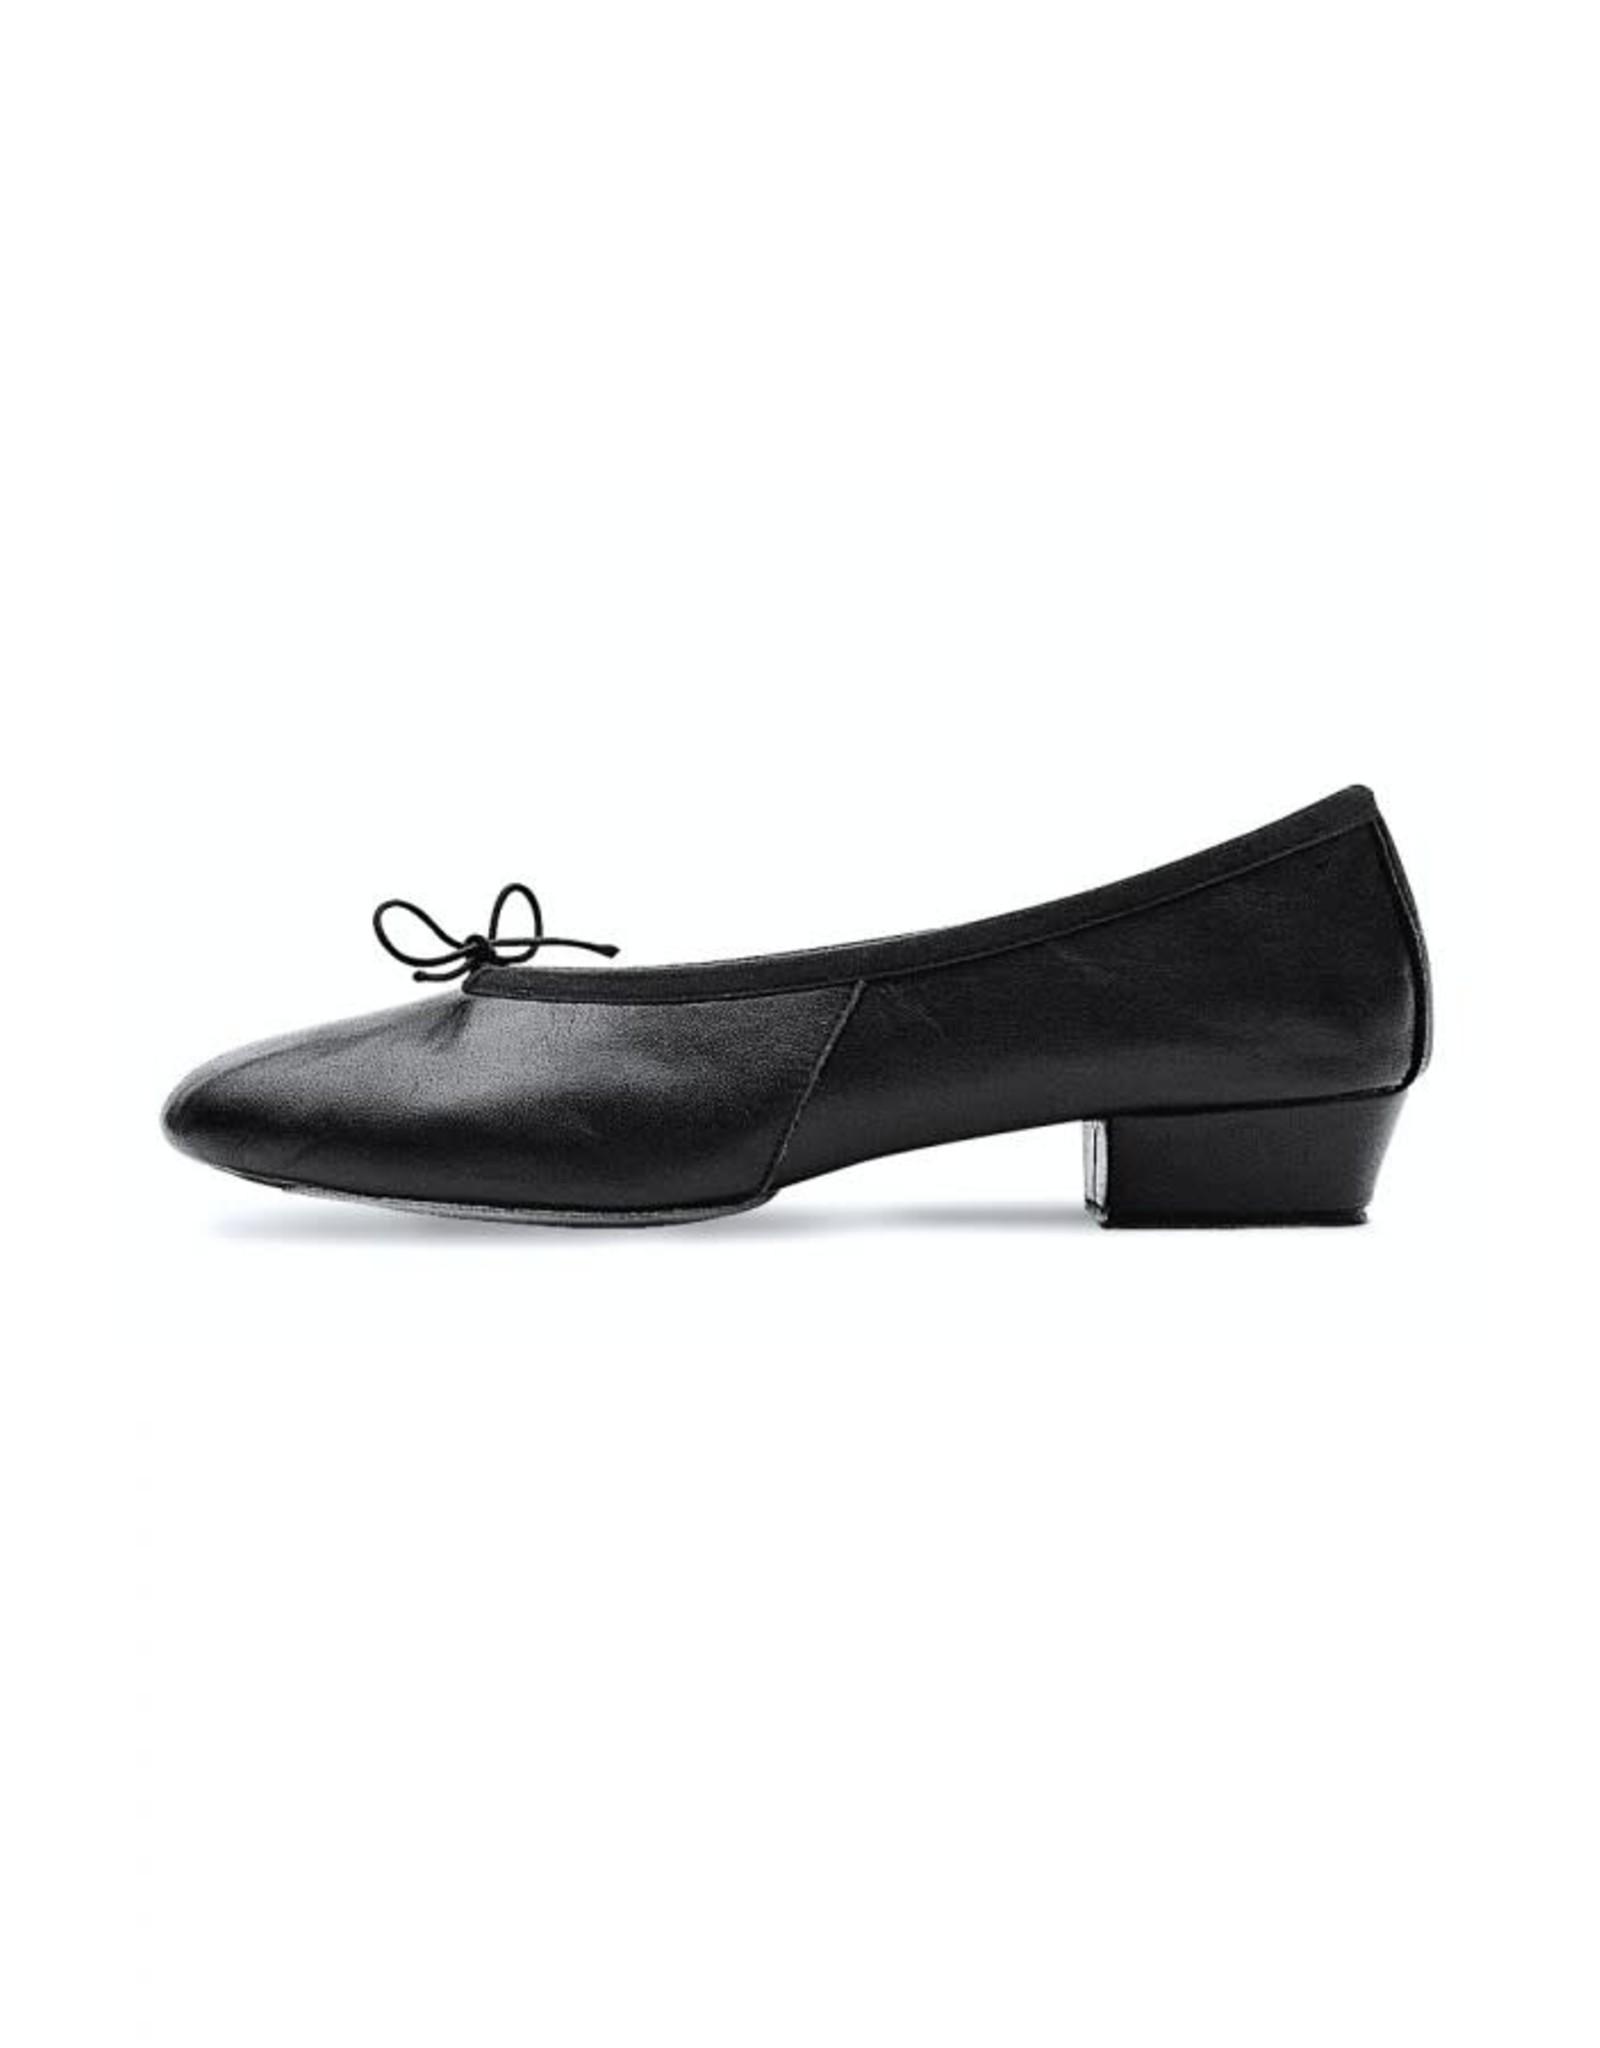 Bloch Bloch Paris Teaching Shoe - Black